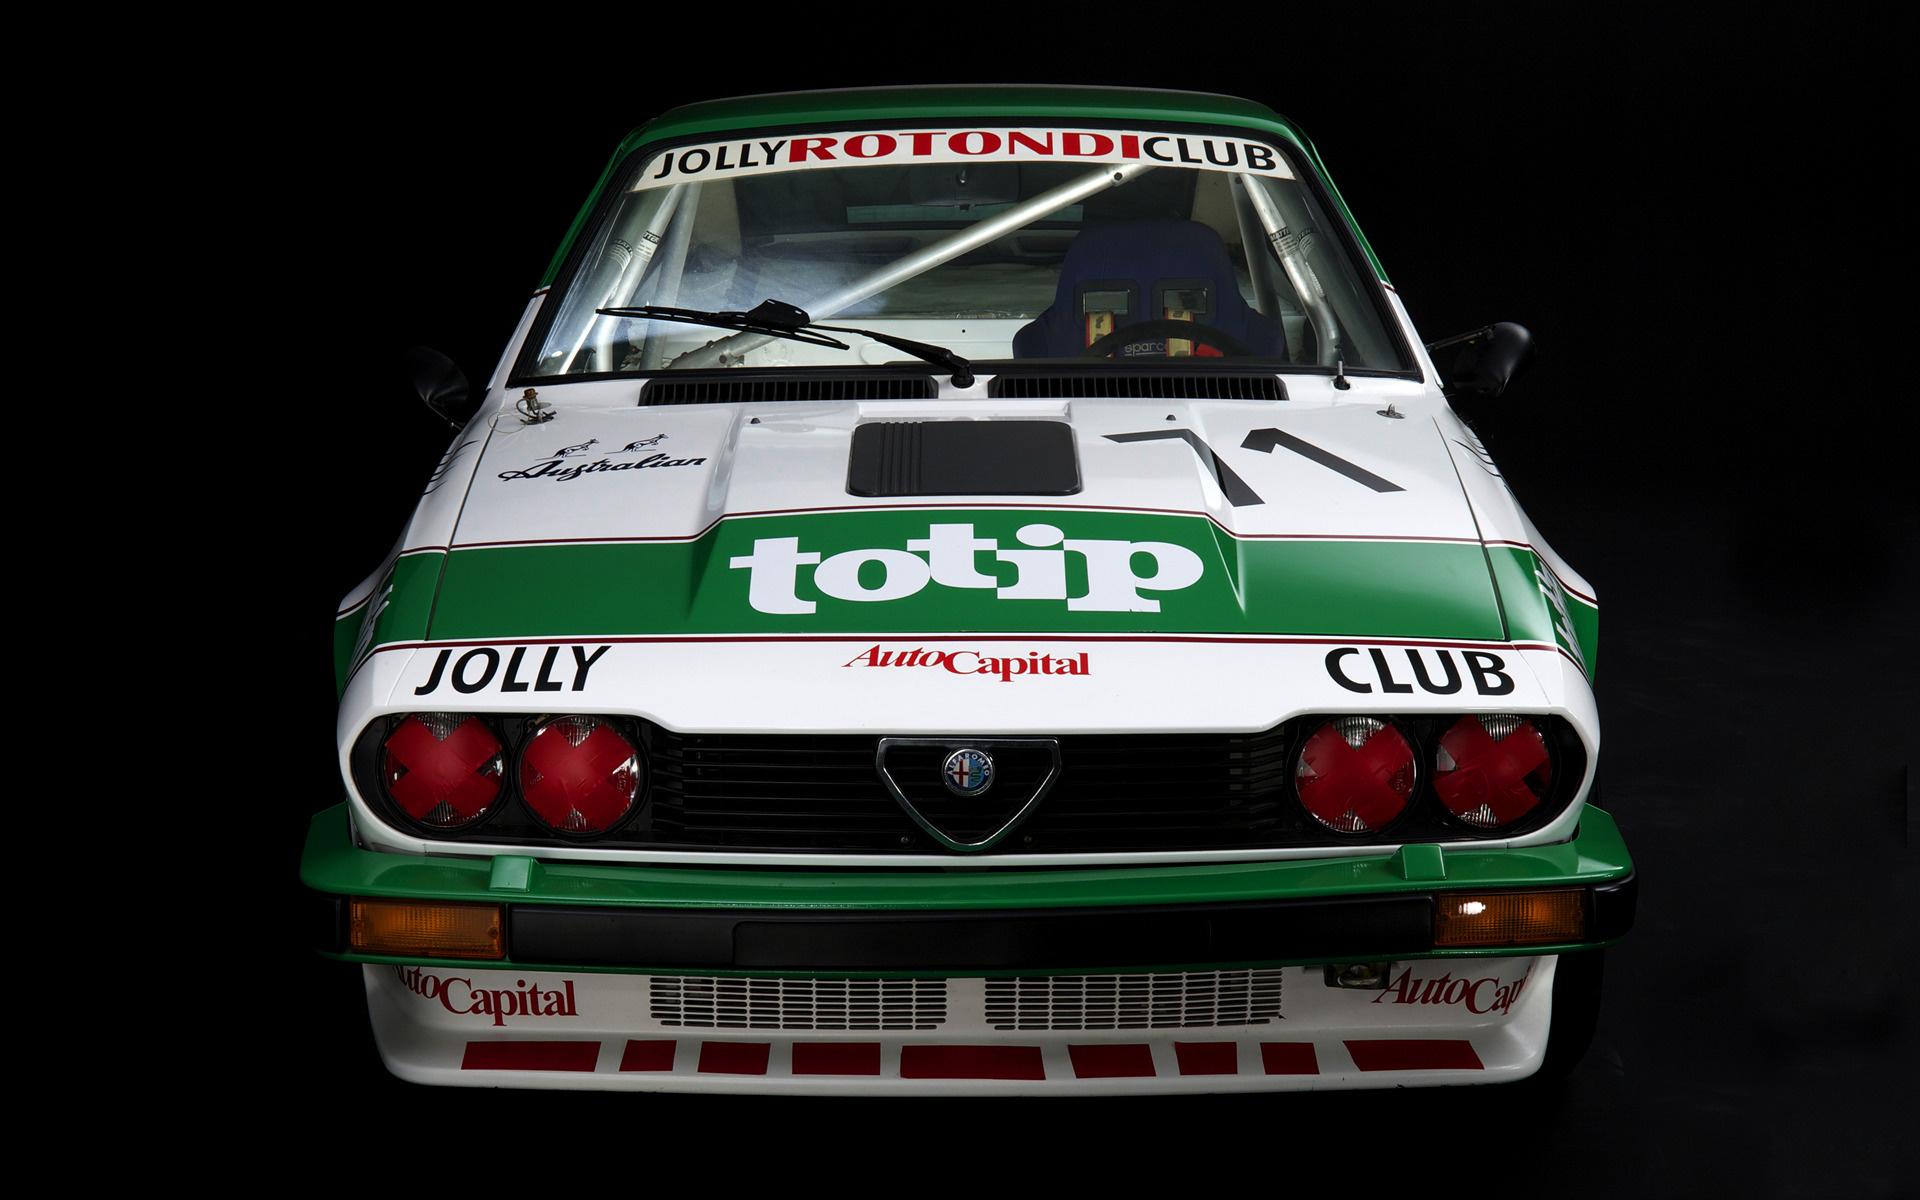 Alfa Romeo Gtv Etcc Car Wallpaper